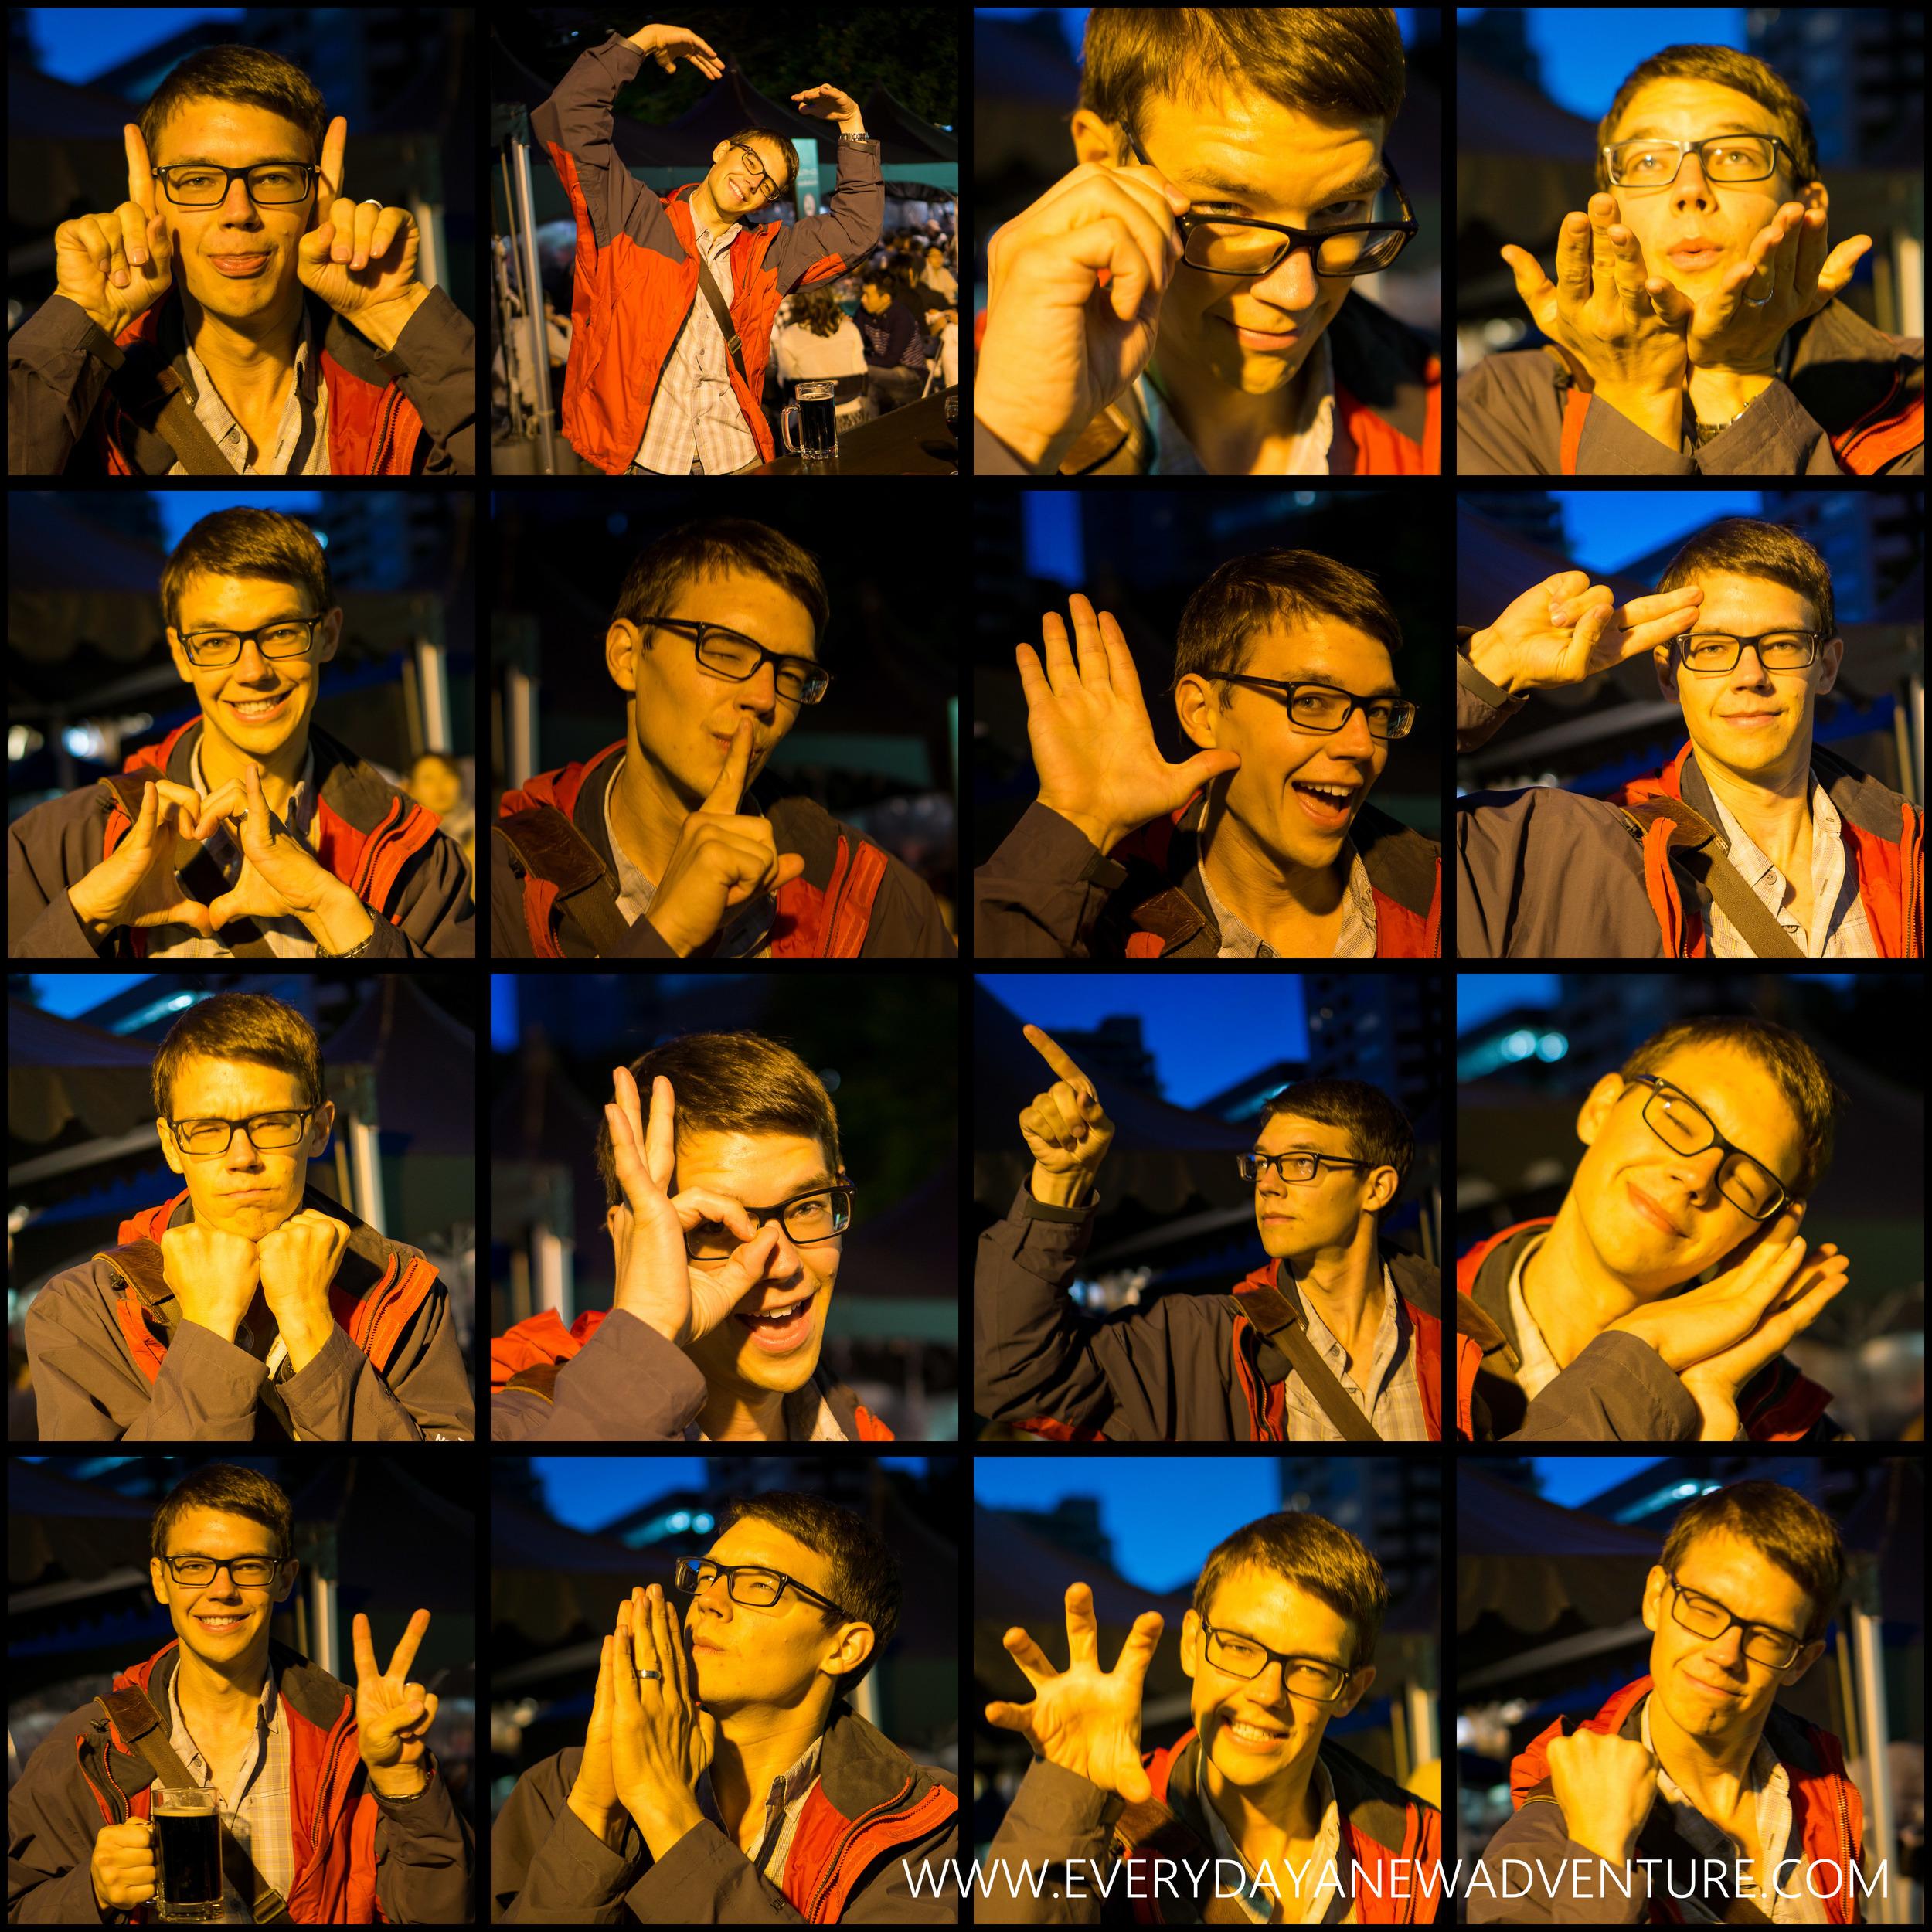 [Squarespace1500-055] Jake Selfie Montage Collage.jpg